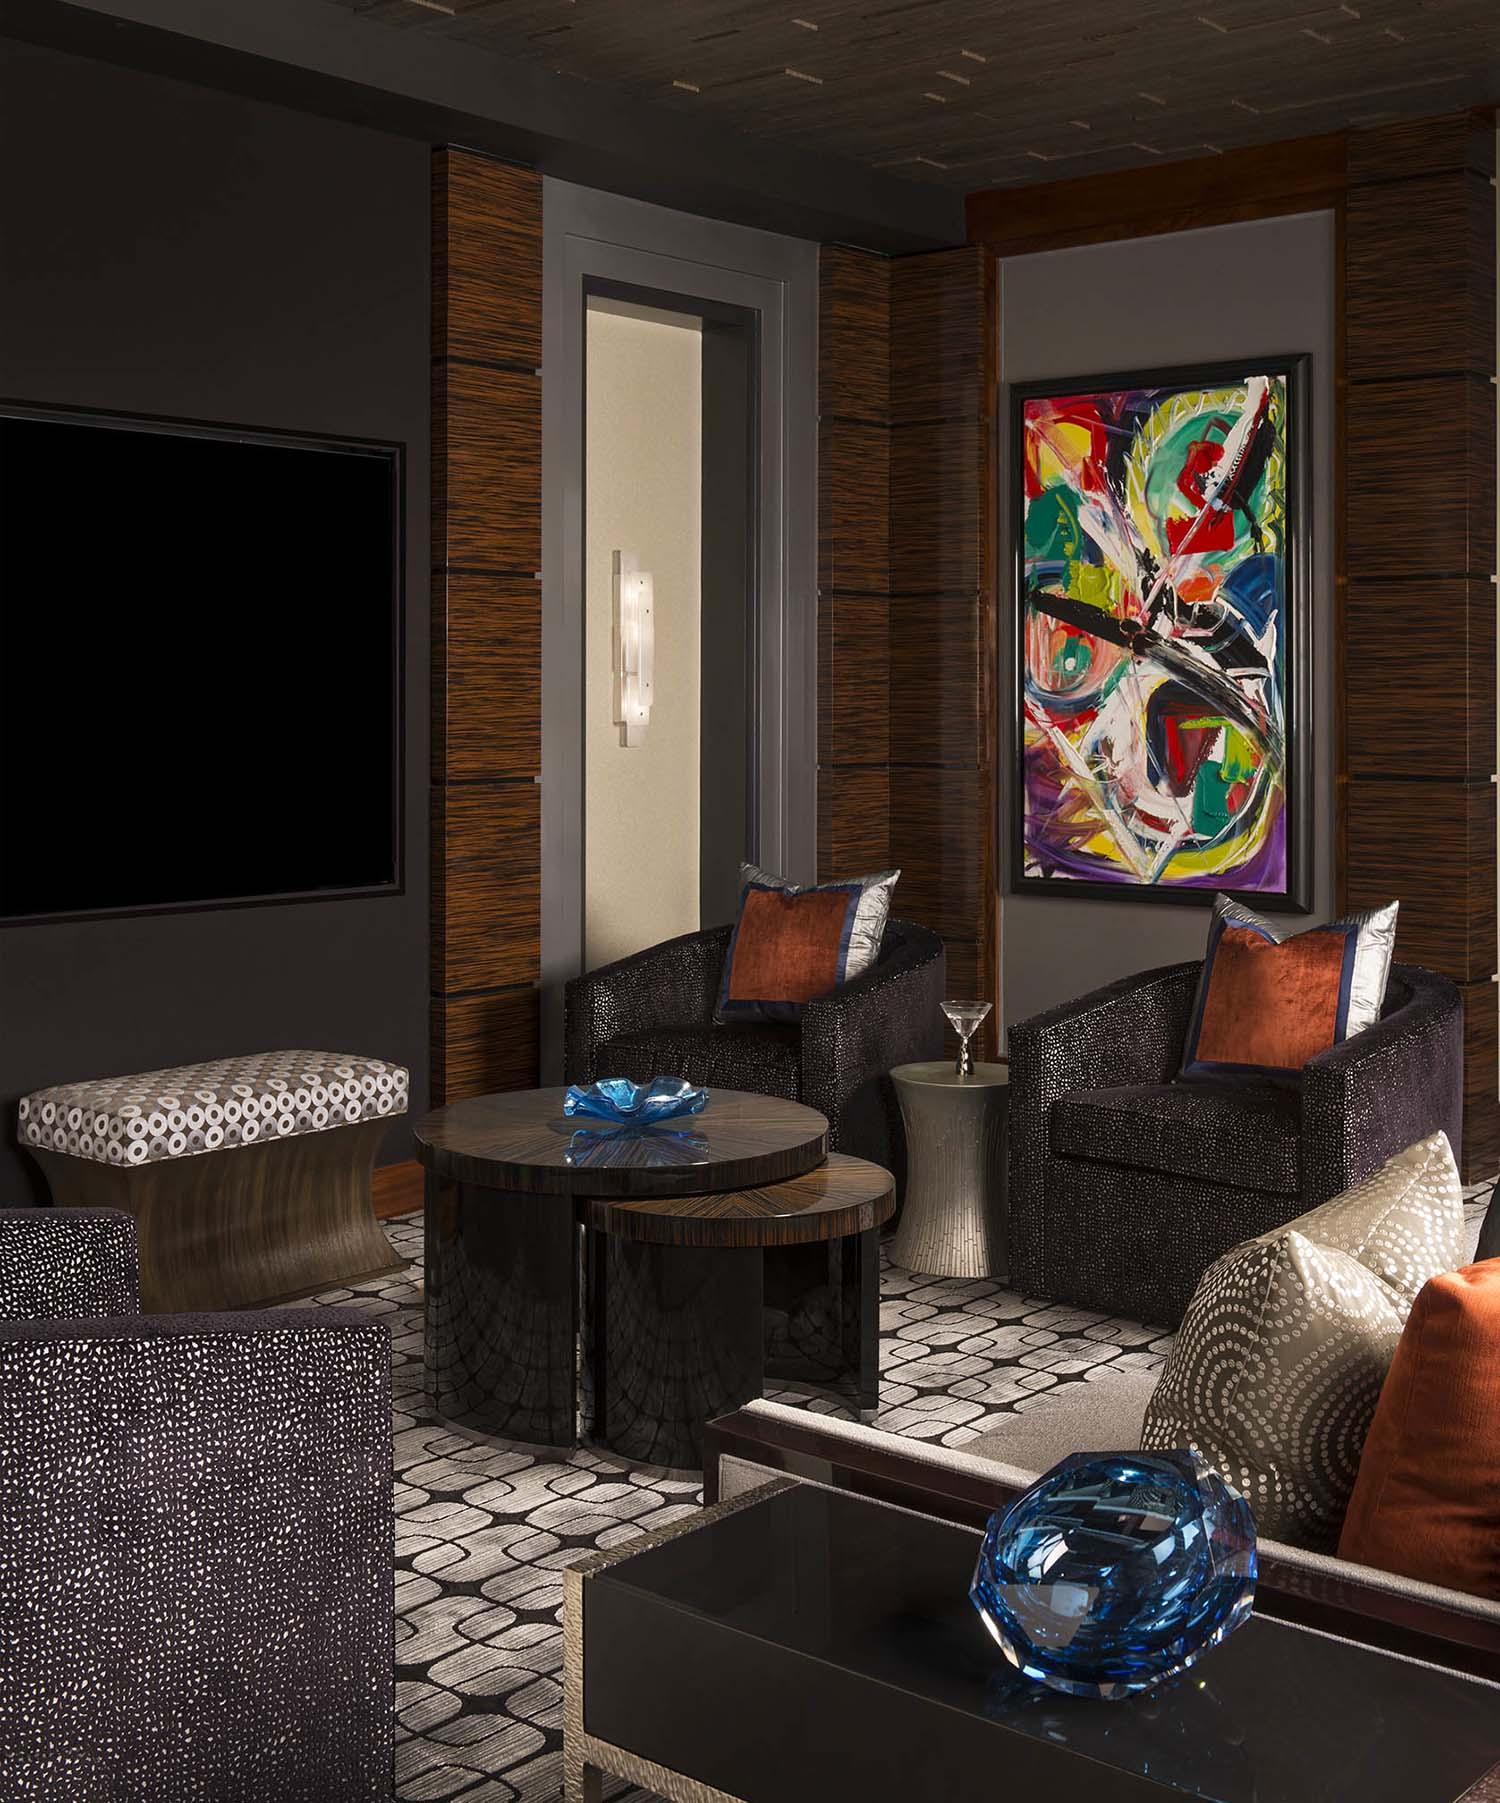 Contemporary Style Home-Dallas Design Group-32-1 Kindesign